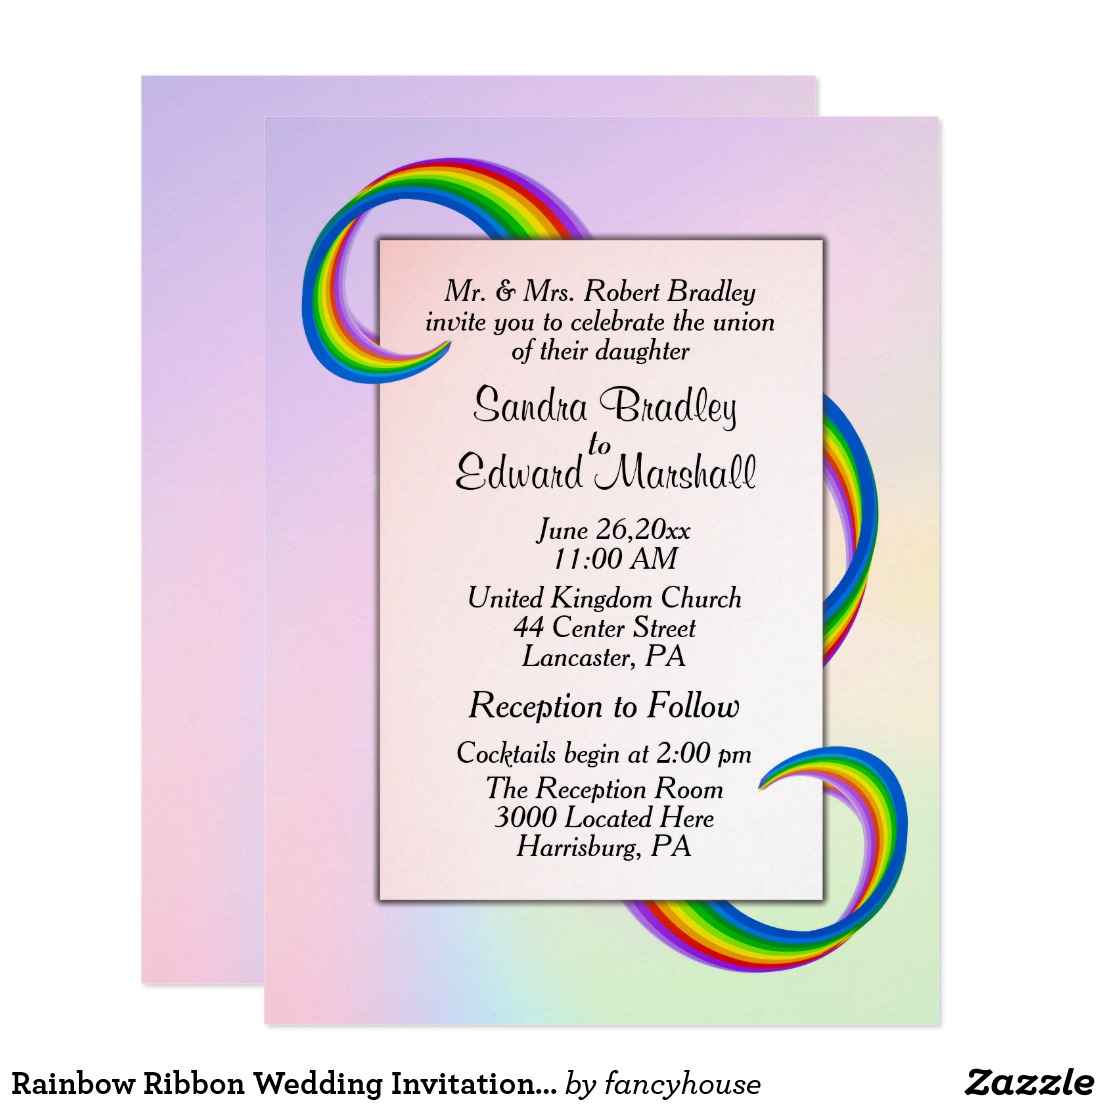 Rainbow Ribbon Wedding Invitation 6.5